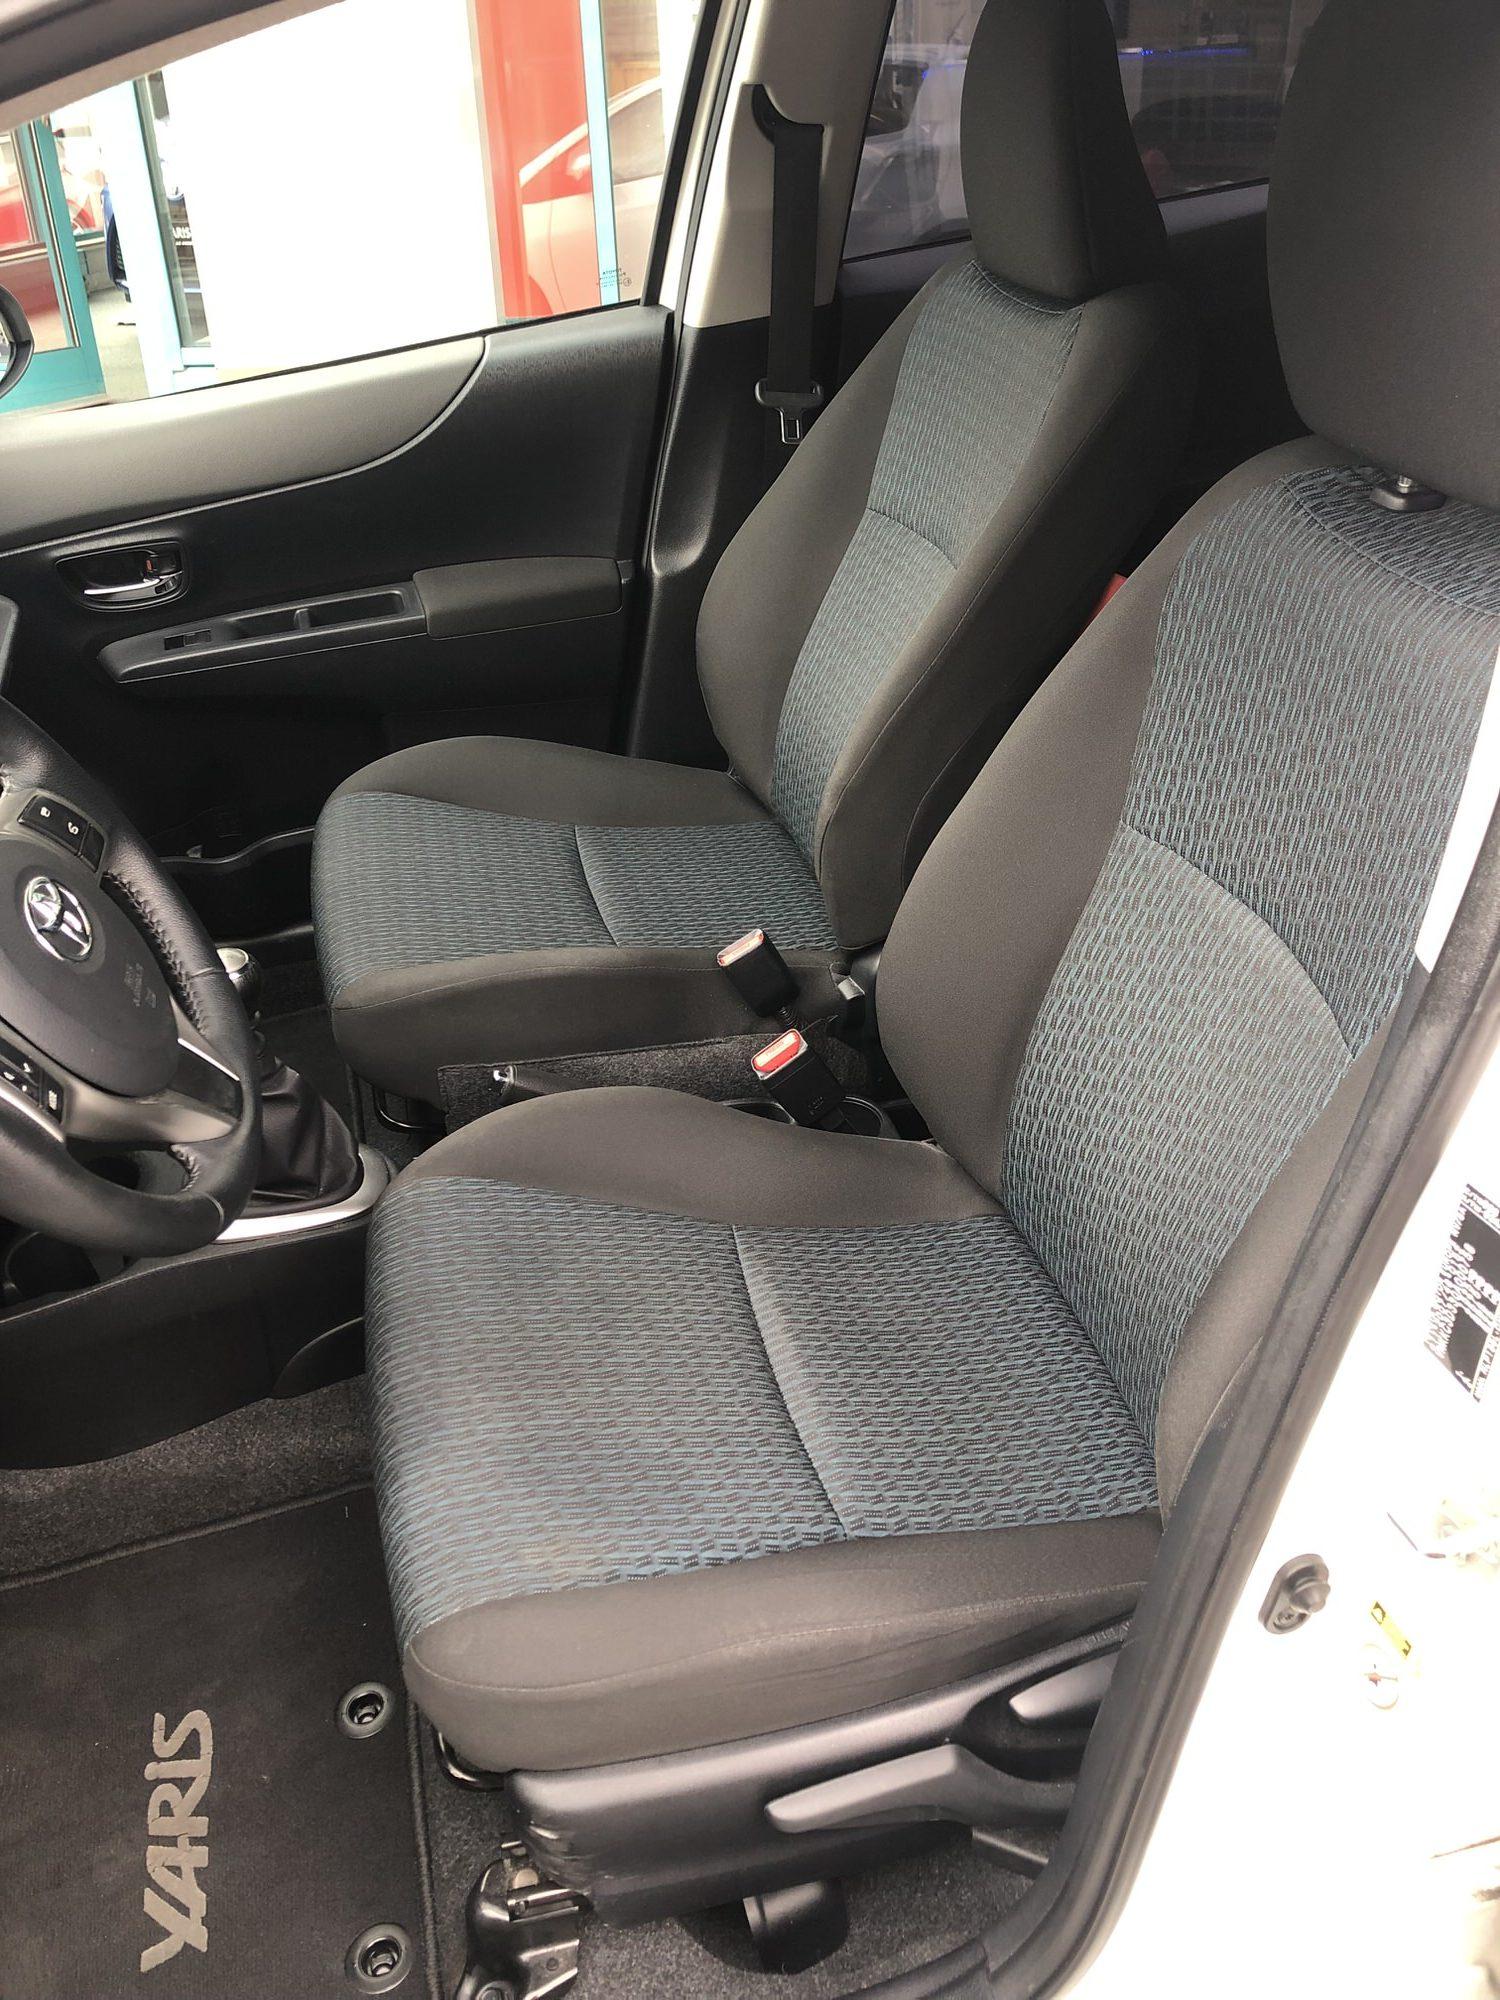 Toyota Yaris 1.4 D 1